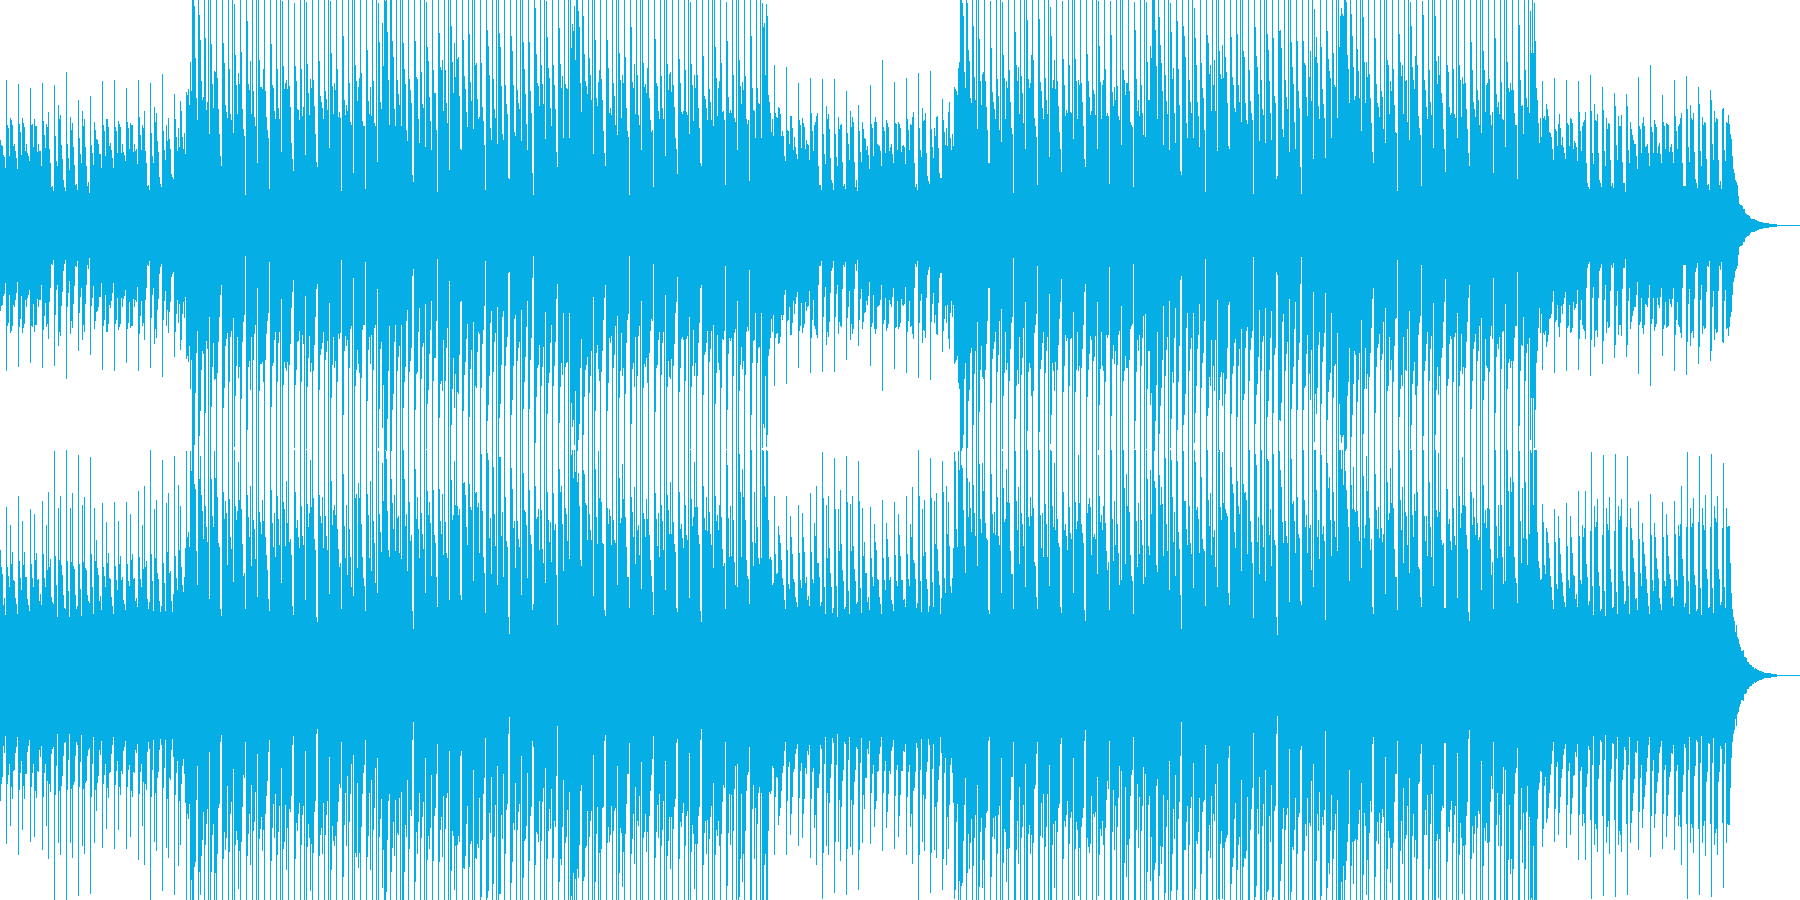 CMや映像に、ハッピーなウクレレ、ポップの再生済みの波形